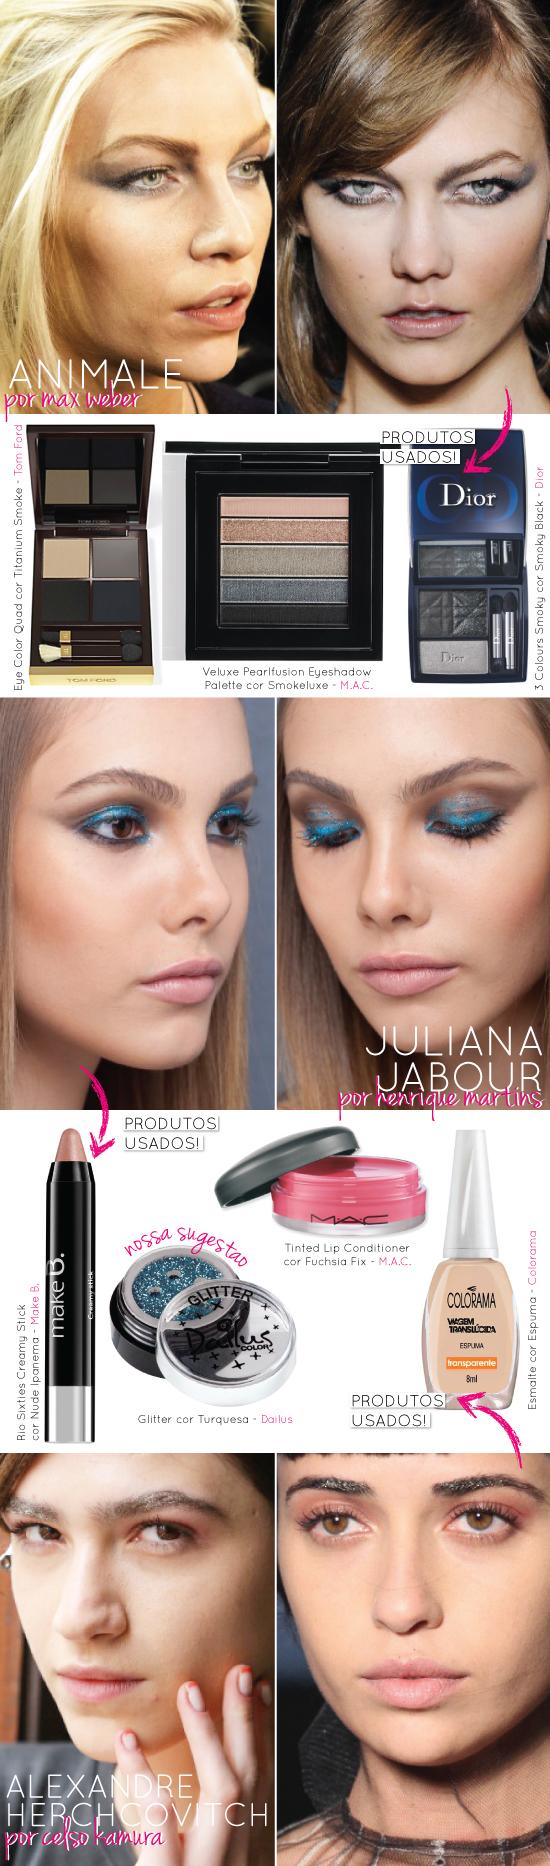 BELEZA-spfw-juliana-jabour-batom-usado-make-maquiagem-animale-sombra-sombras-brilho-max-weber-esmalte-colorama-alexandre-herchcovitch